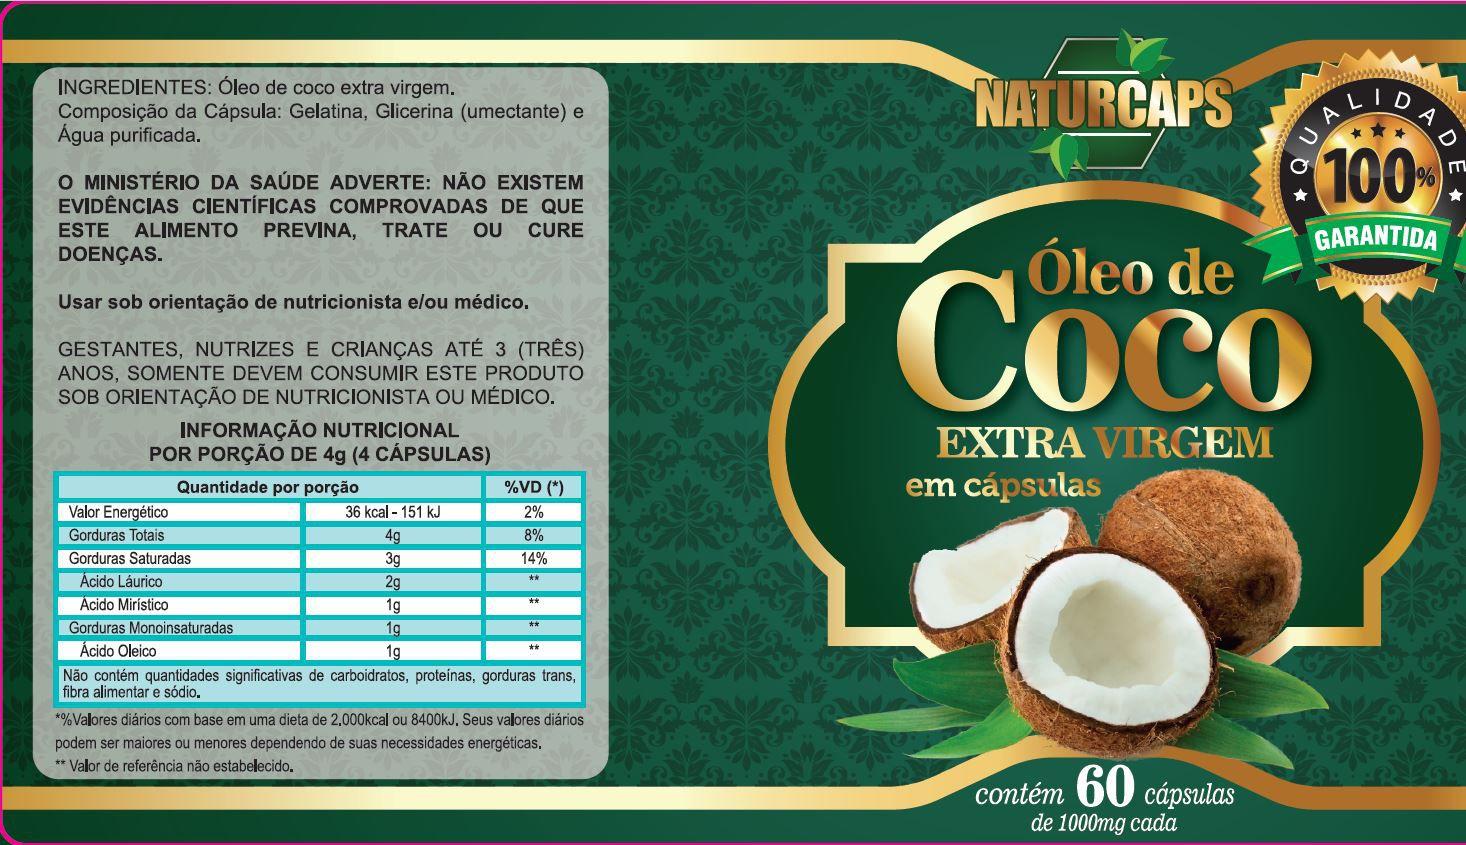 Oleo De Coco 60 Capsulas Naturcaps - 4 Potes